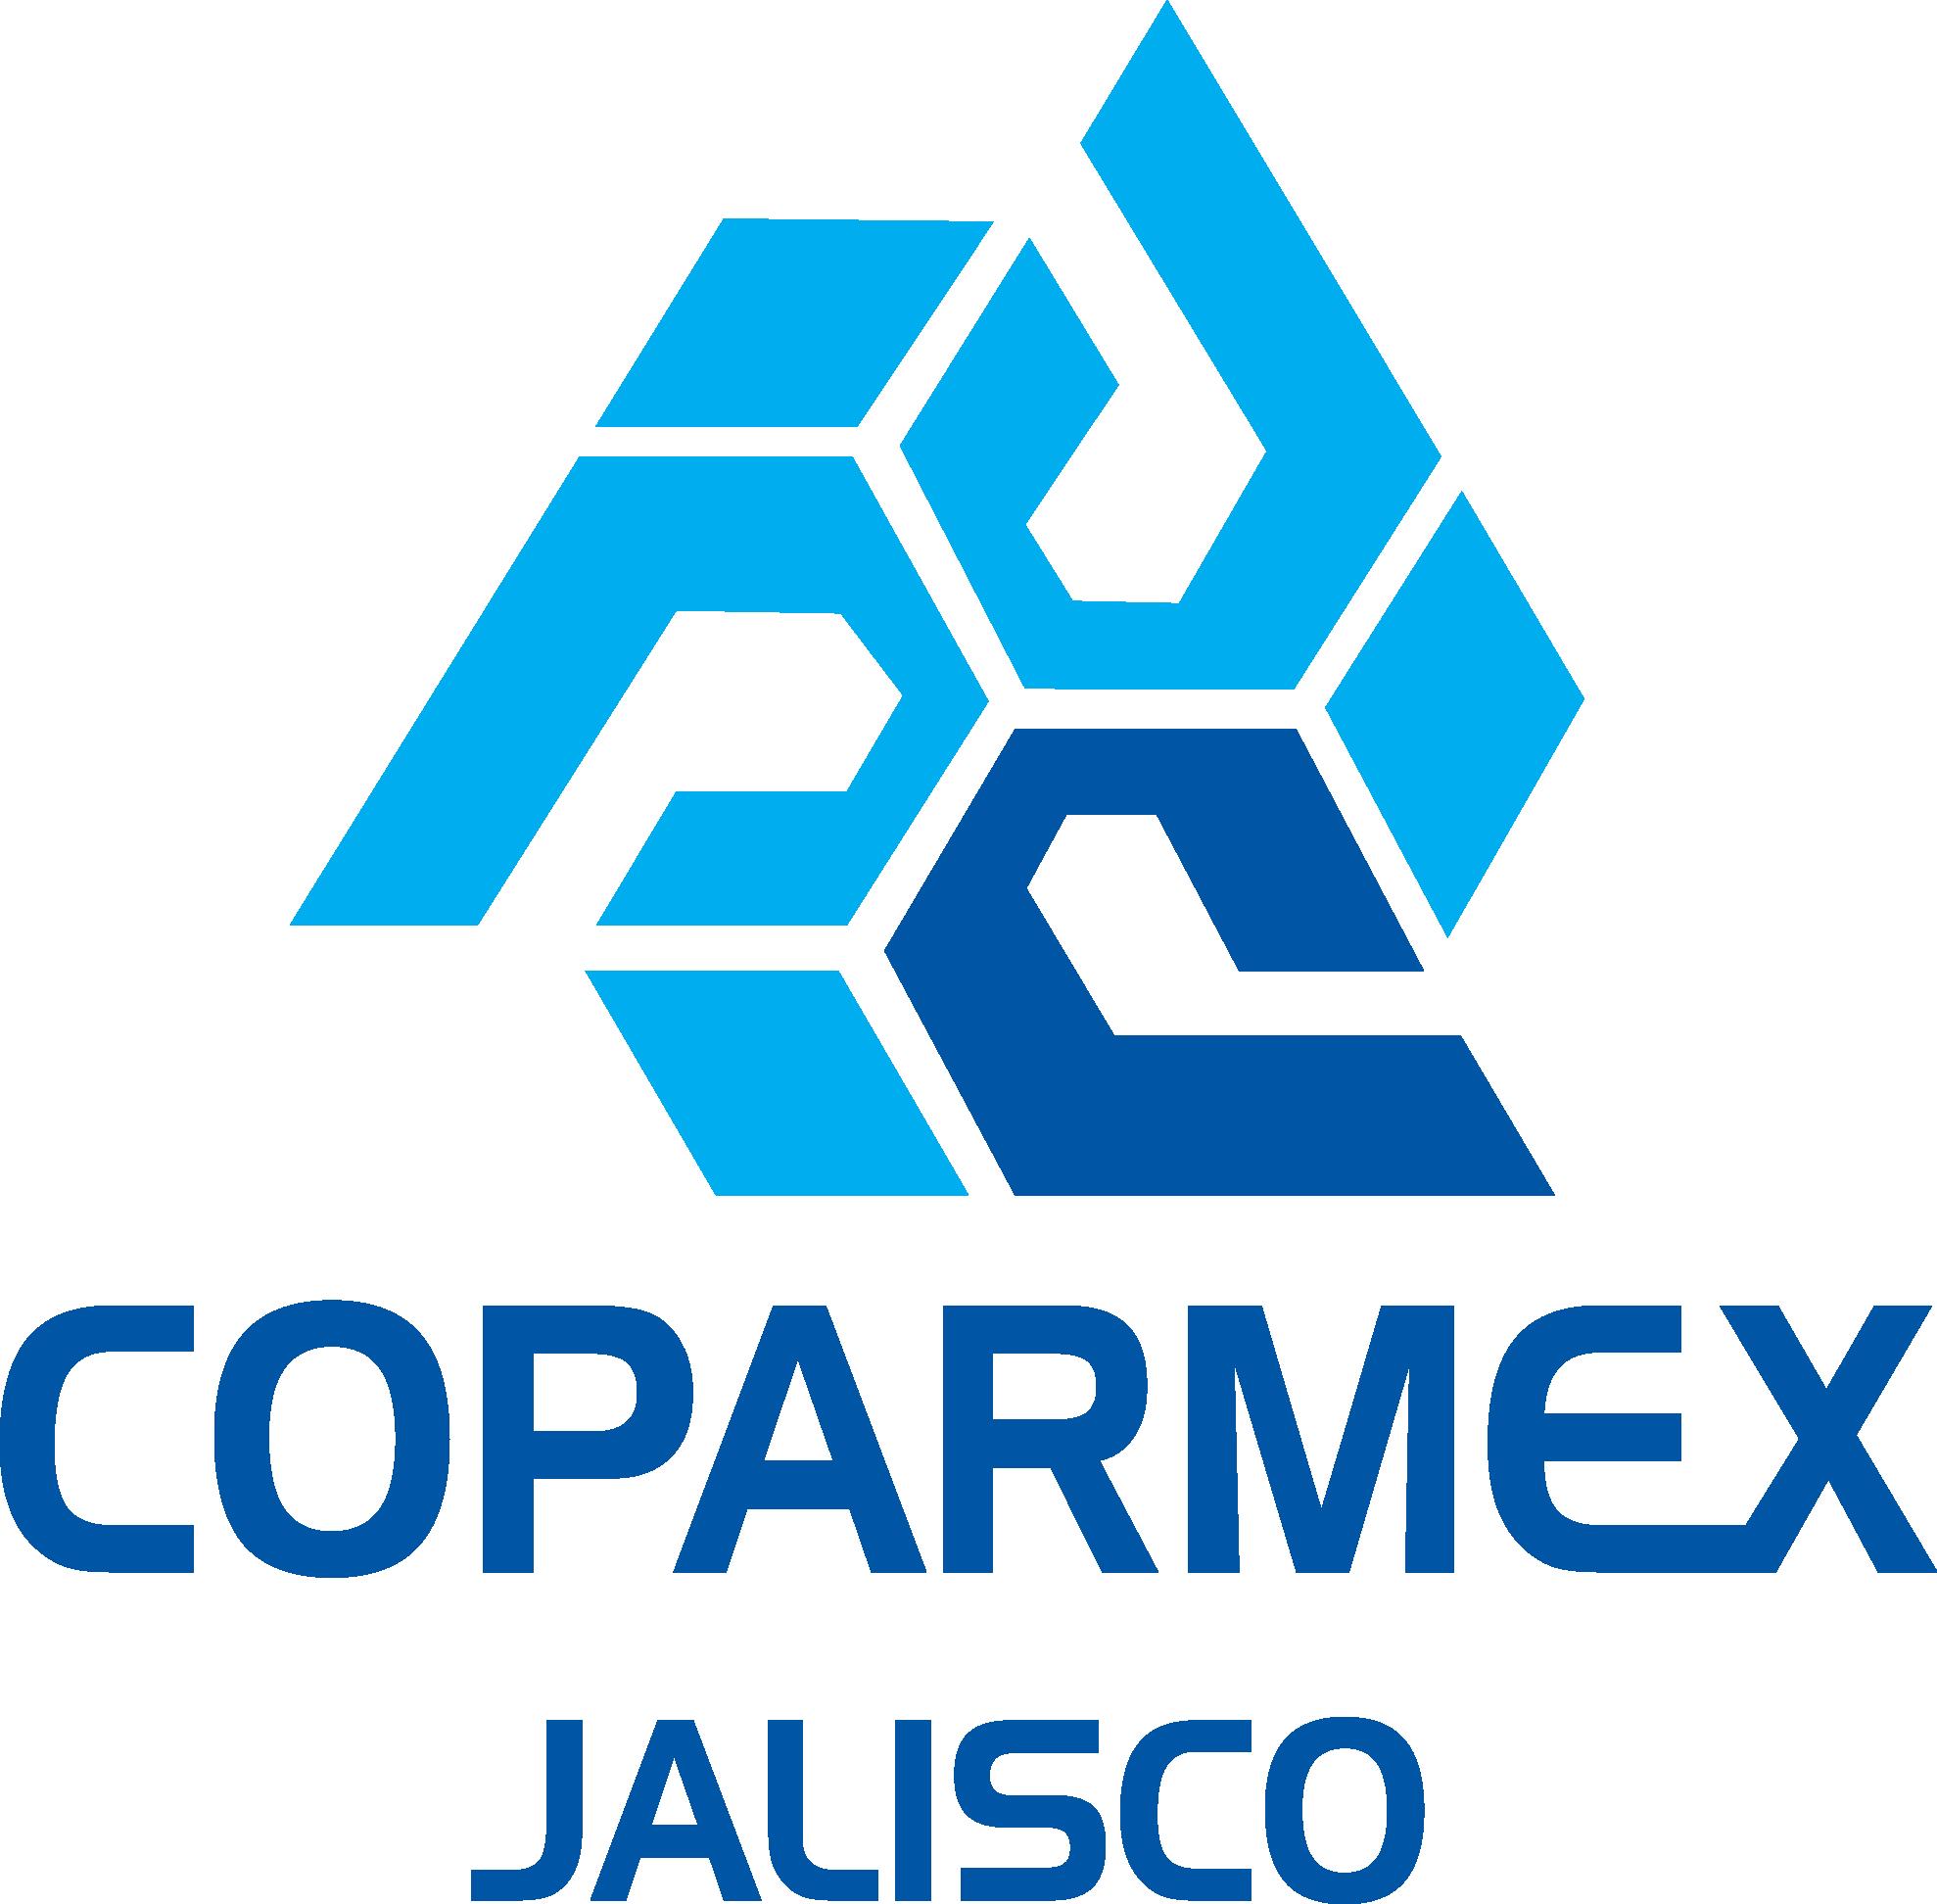 logocoparmex – trulinux